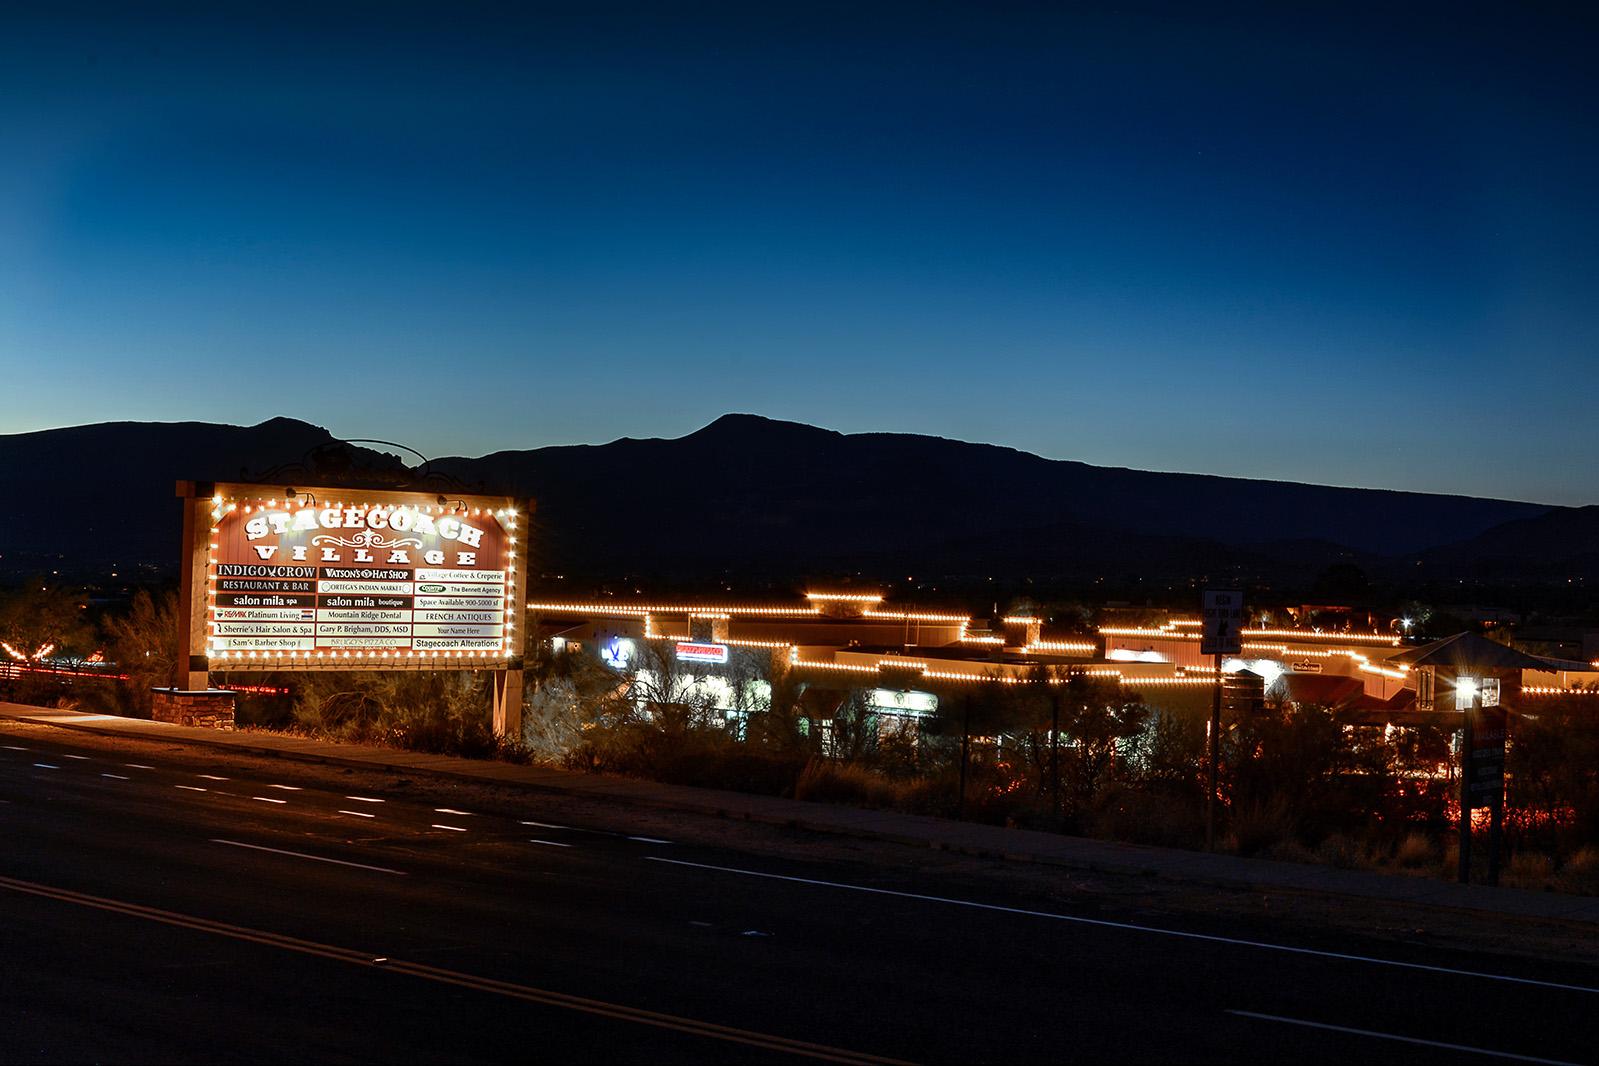 stagecoach village at night